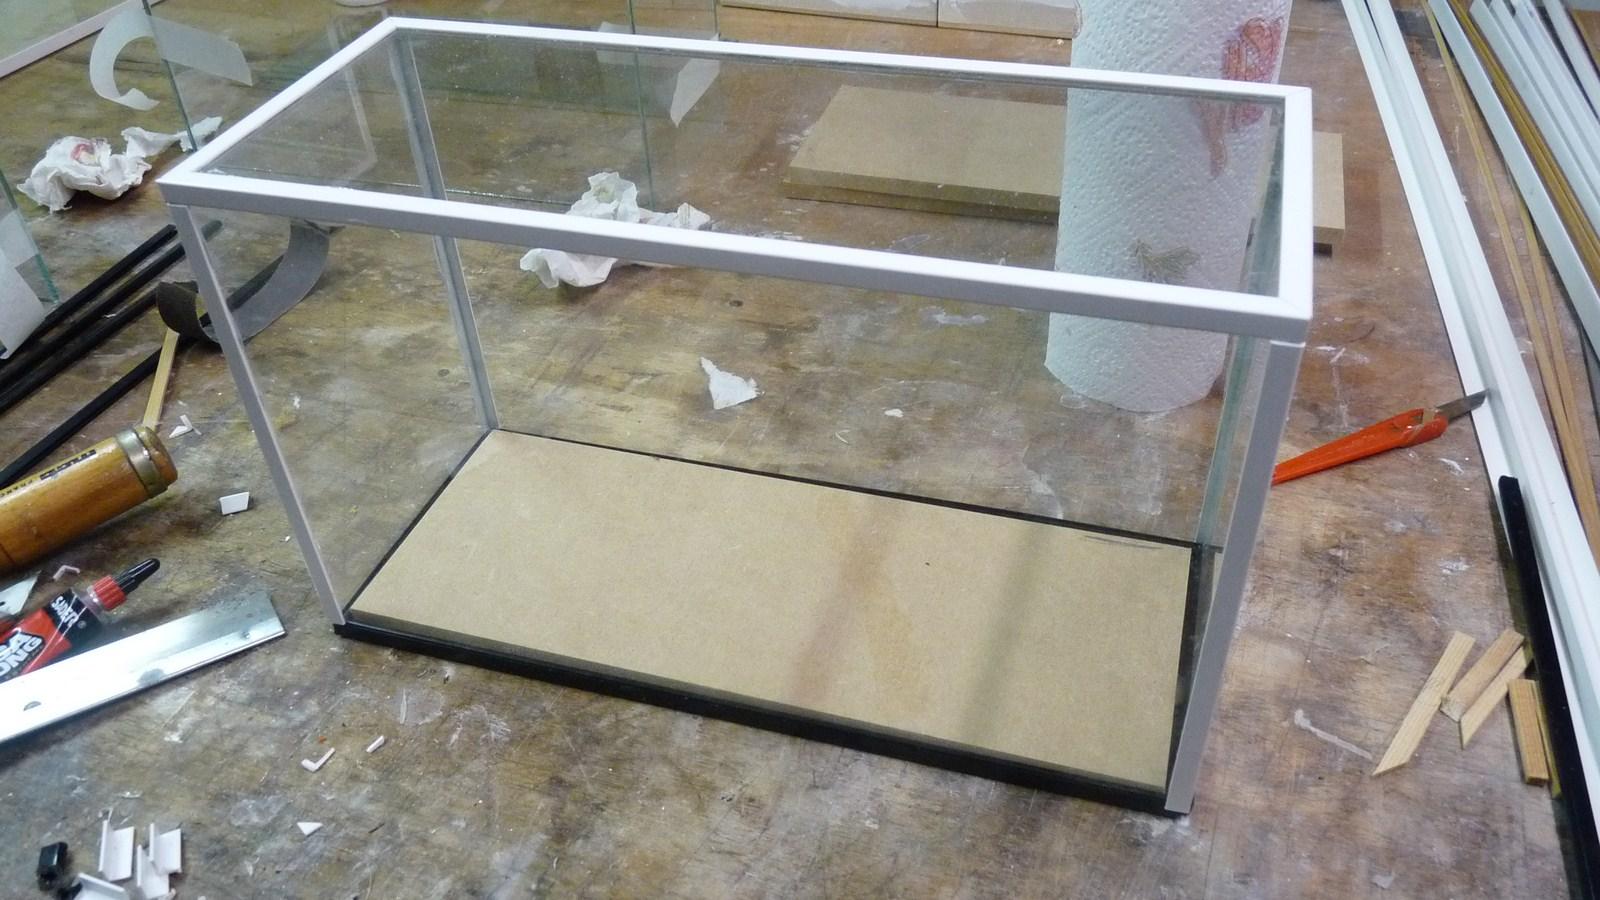 fabriquer une vitrine fabriquer ses propres vitrines en verre. Black Bedroom Furniture Sets. Home Design Ideas